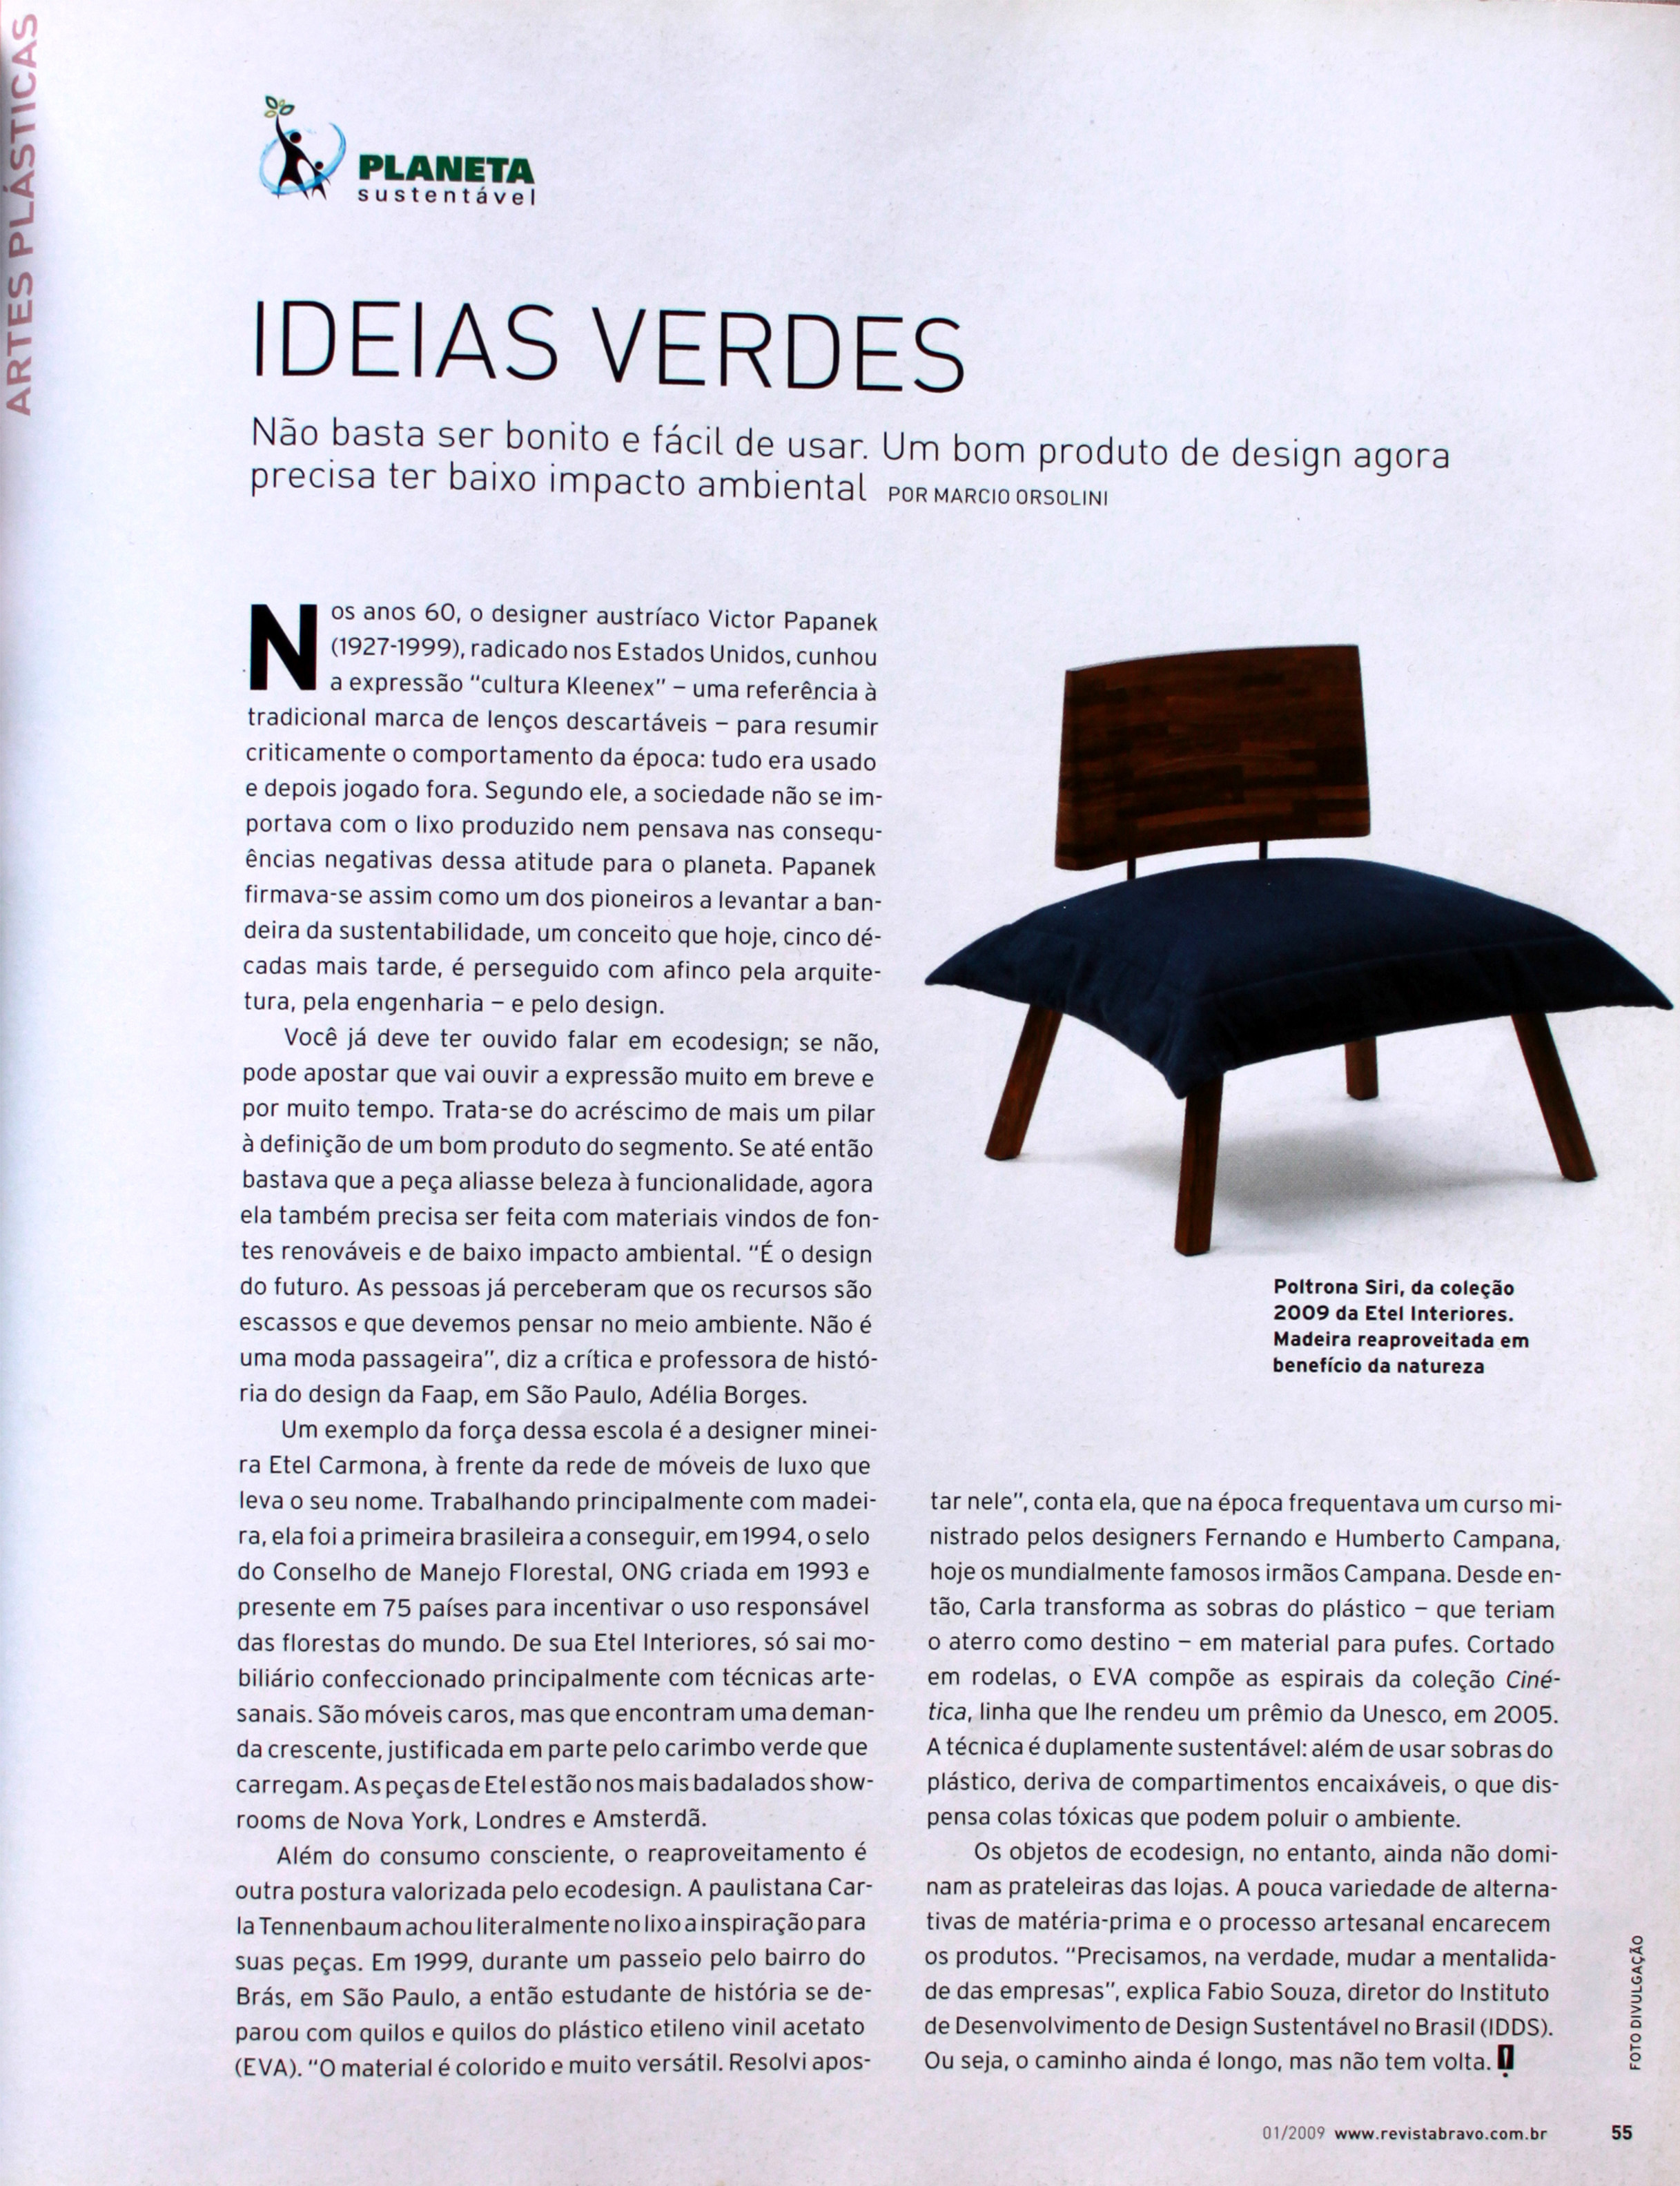 Ideias Verdes - Revista Bravo